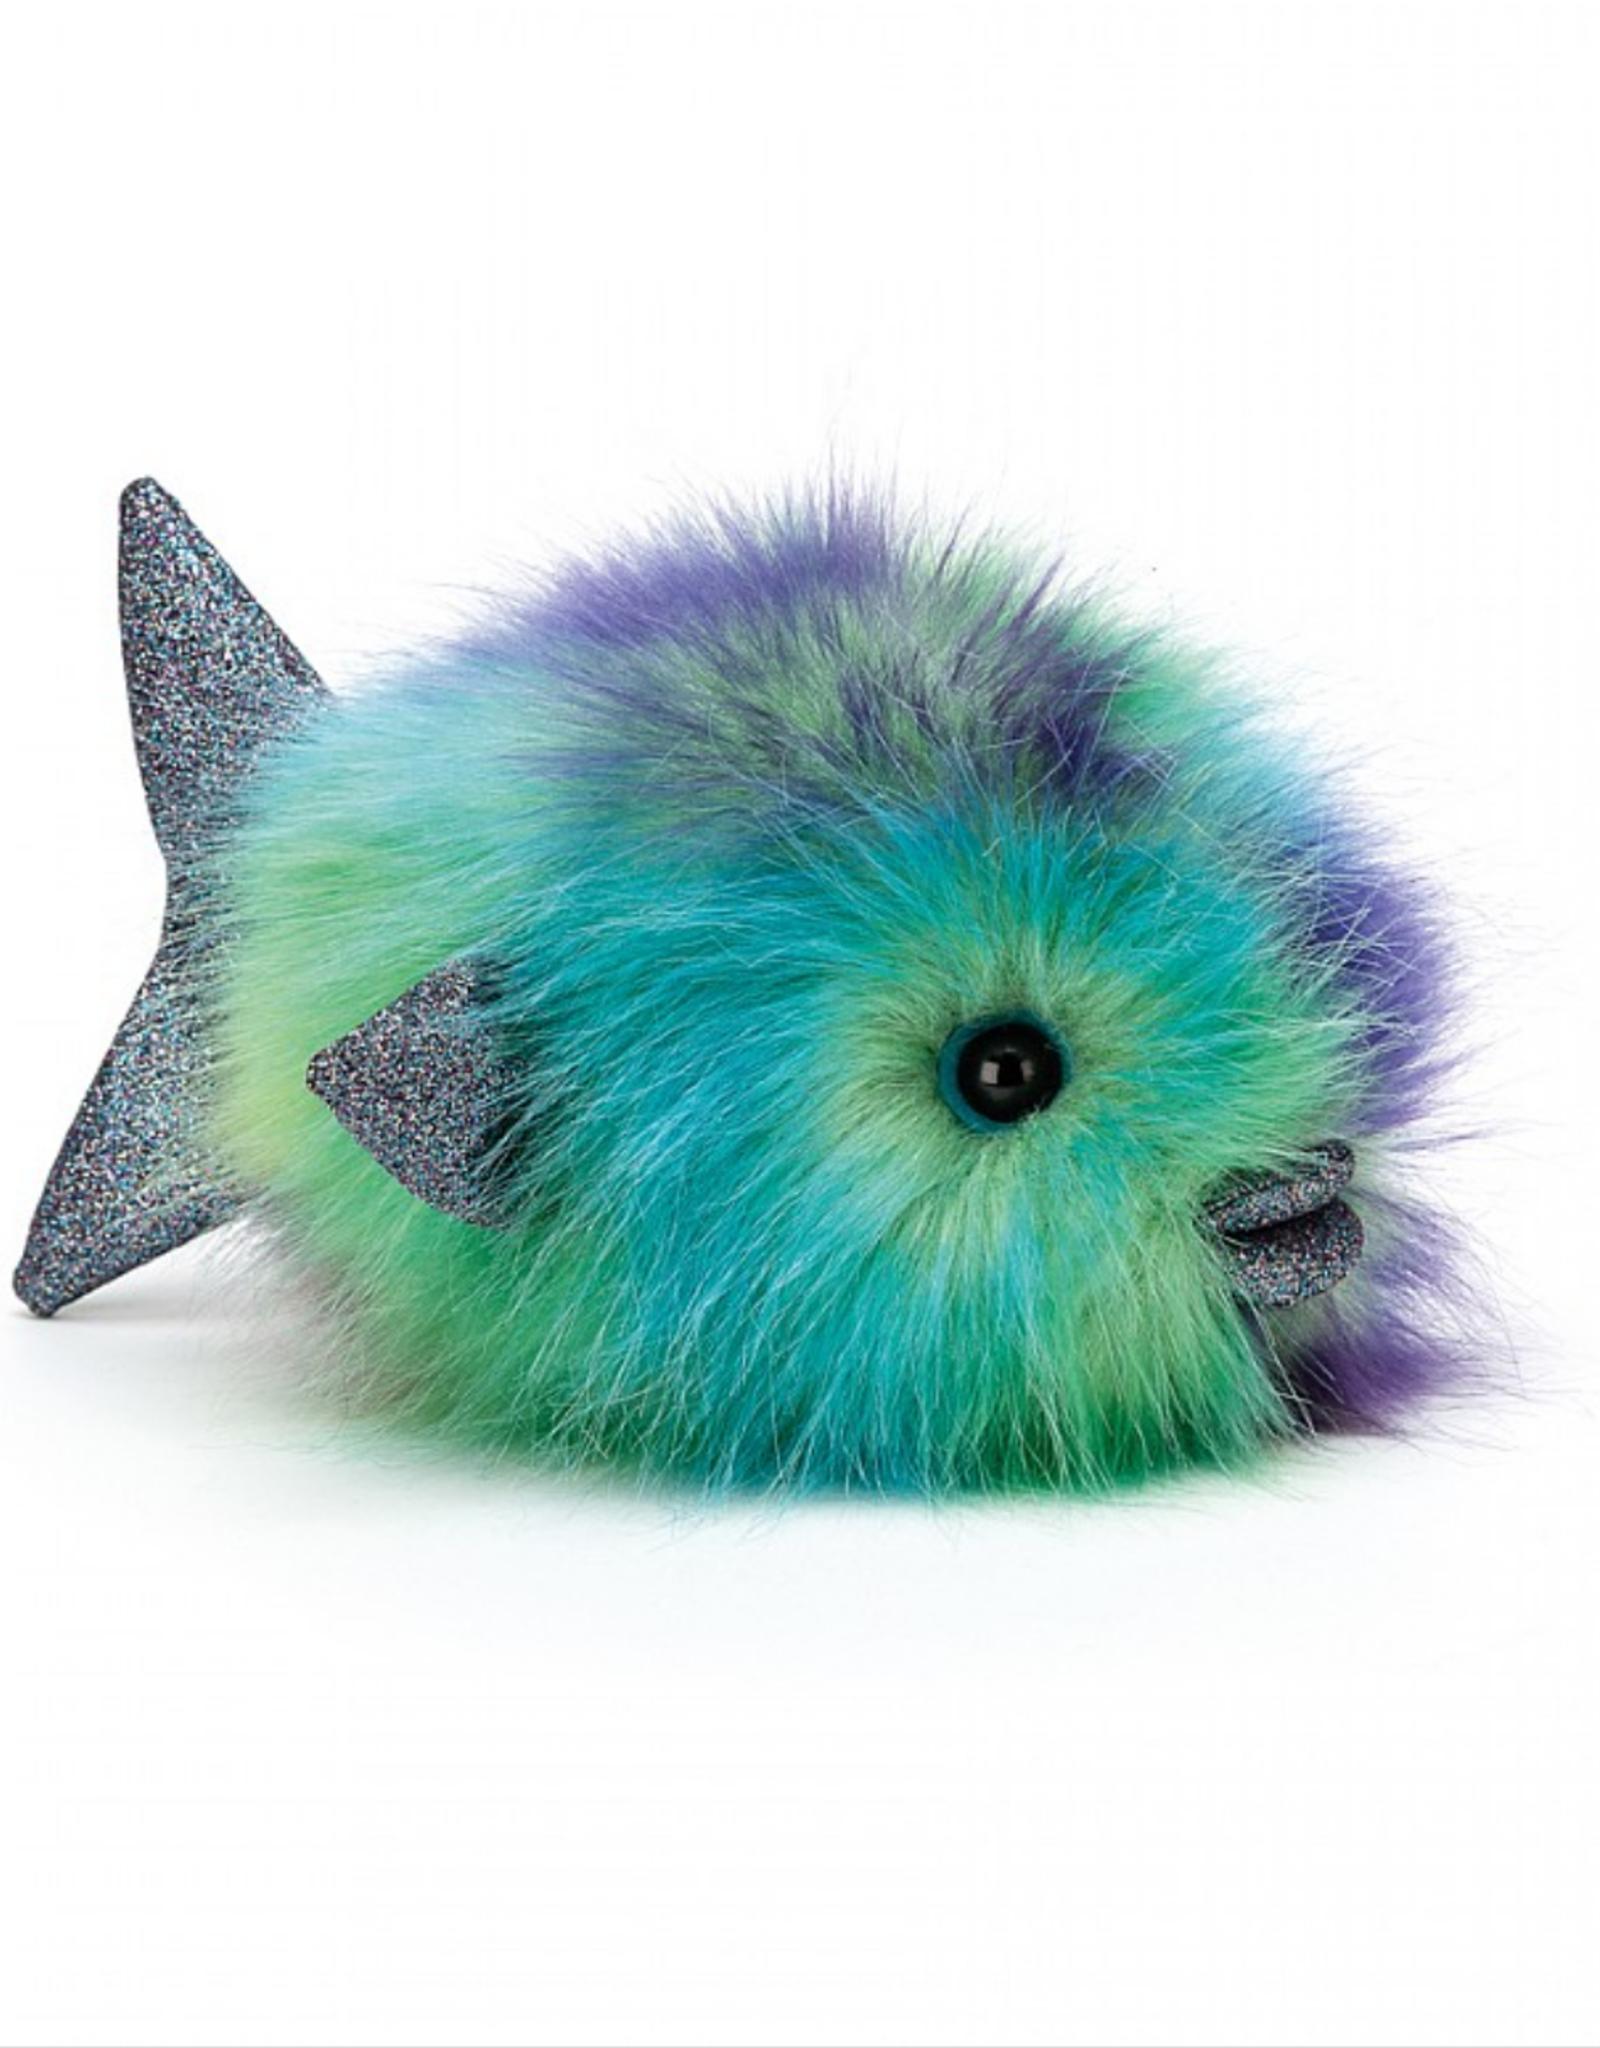 JELLYCAT JellyCat Disco Fish Jewel